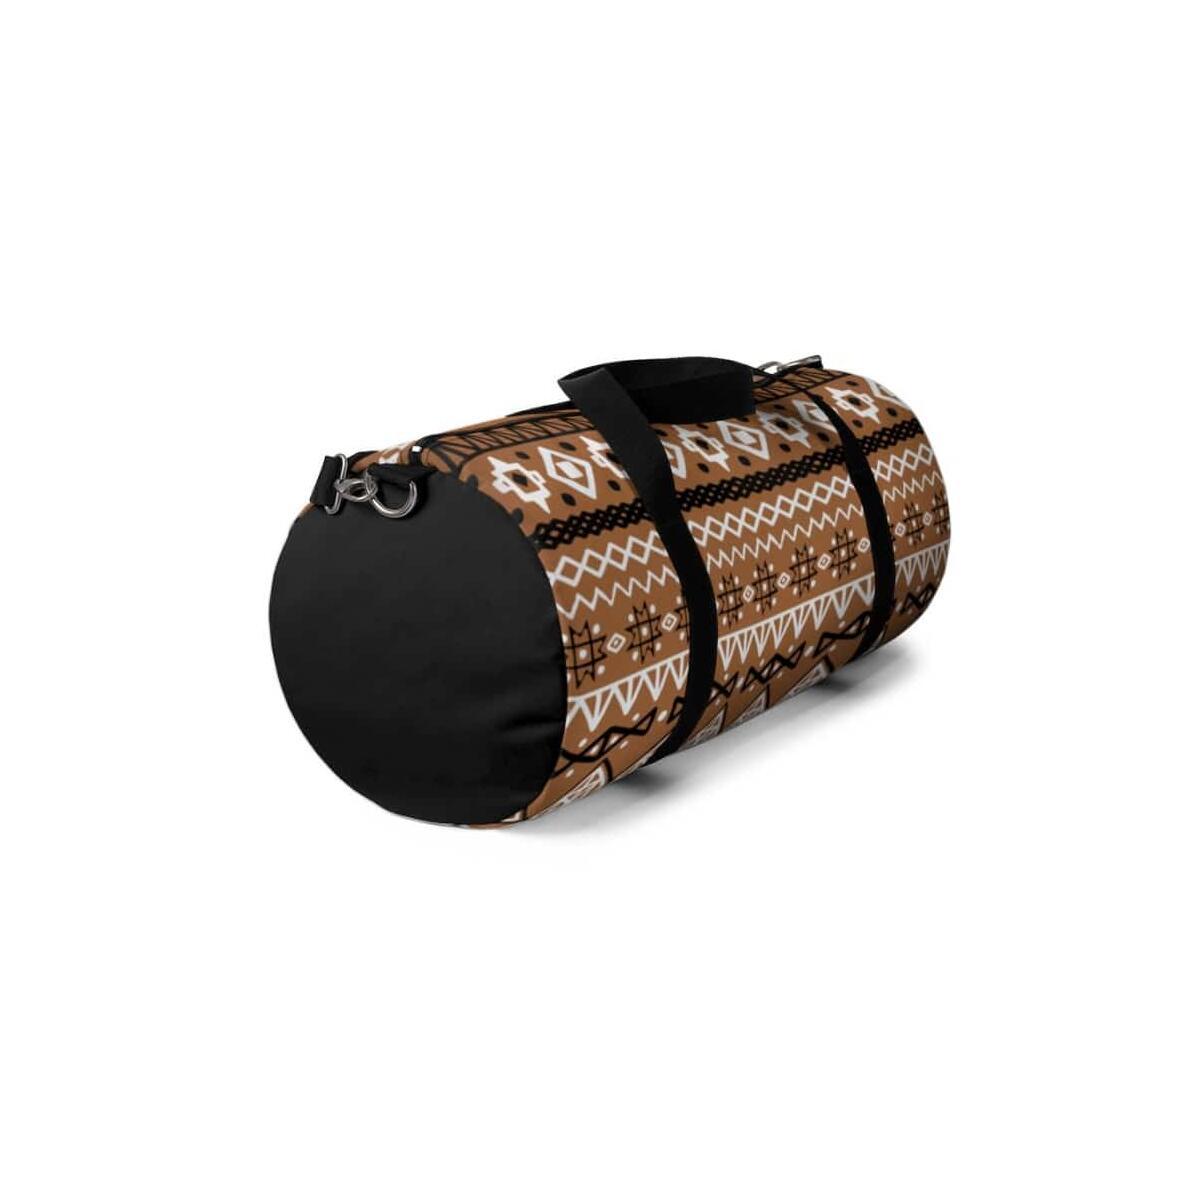 Brown African Mud cloth Duffel Bag